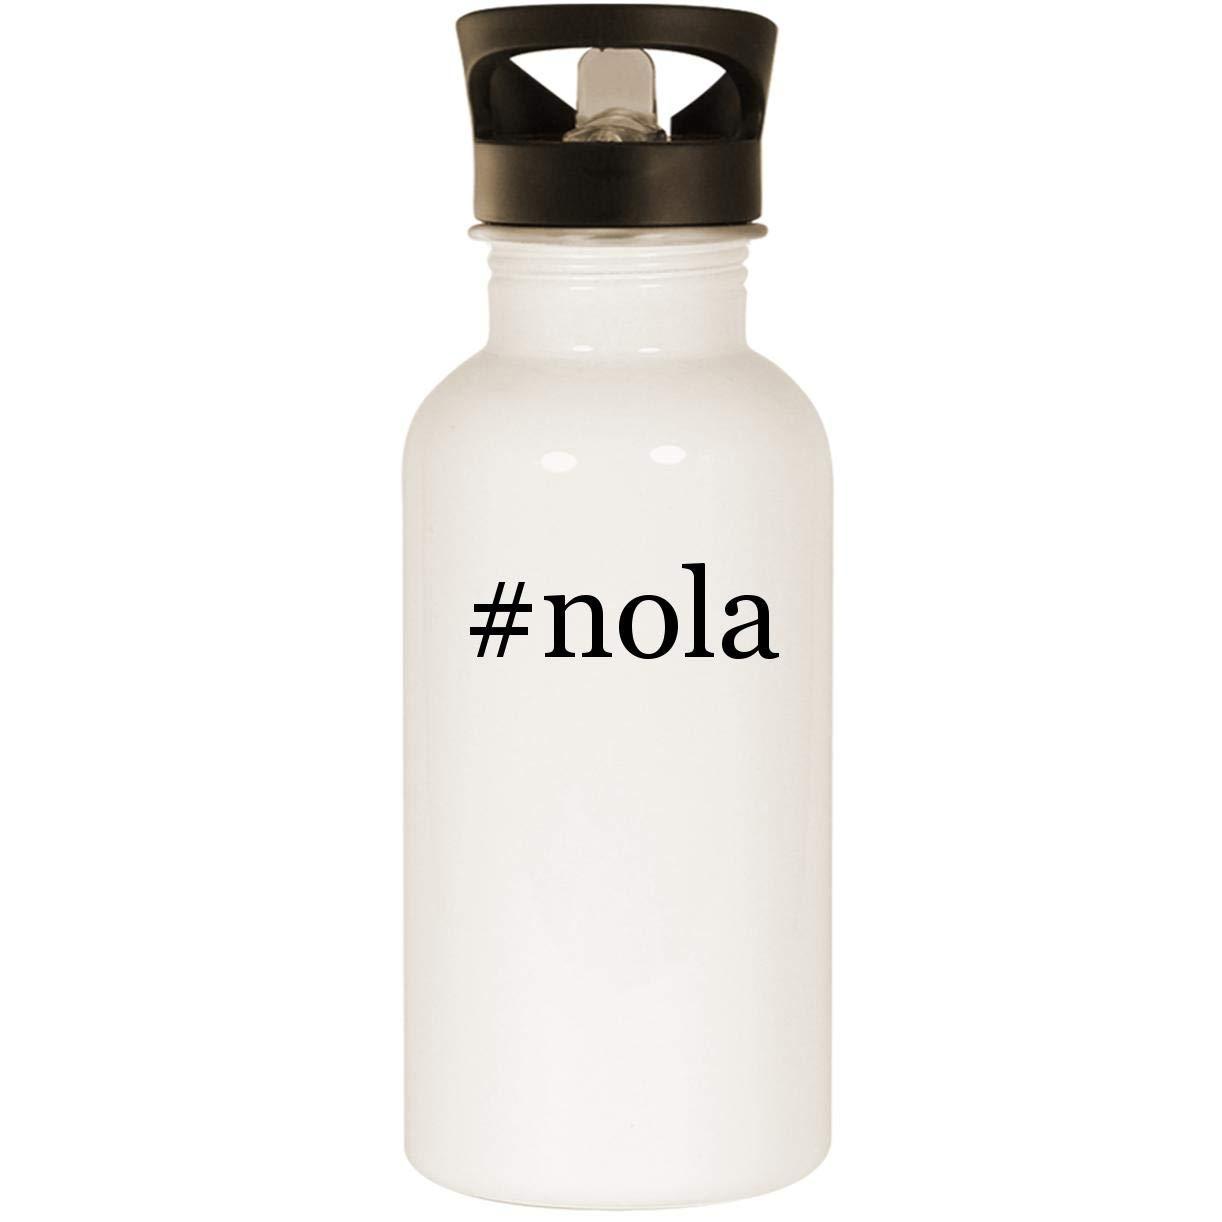 #nola - Stainless Steel 20oz Road Ready Water Bottle, White